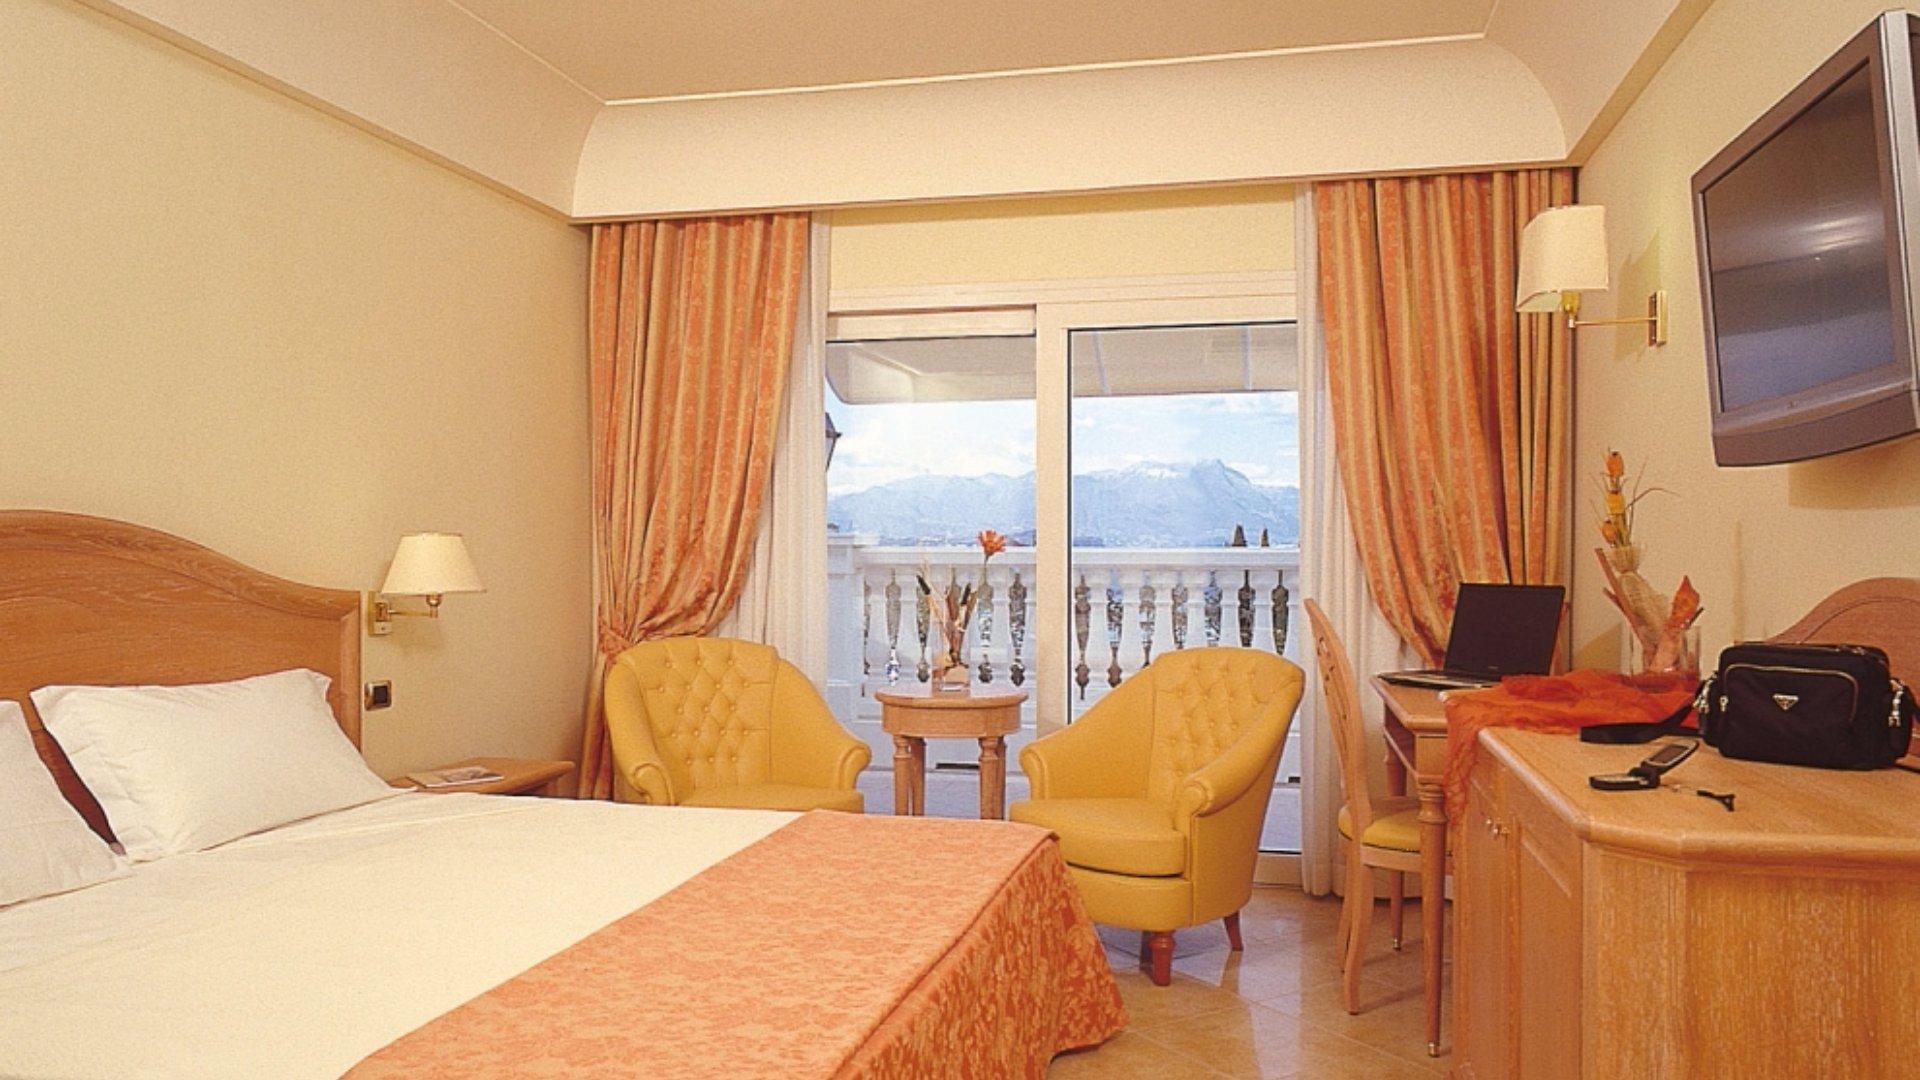 Palace Hotel**** 4